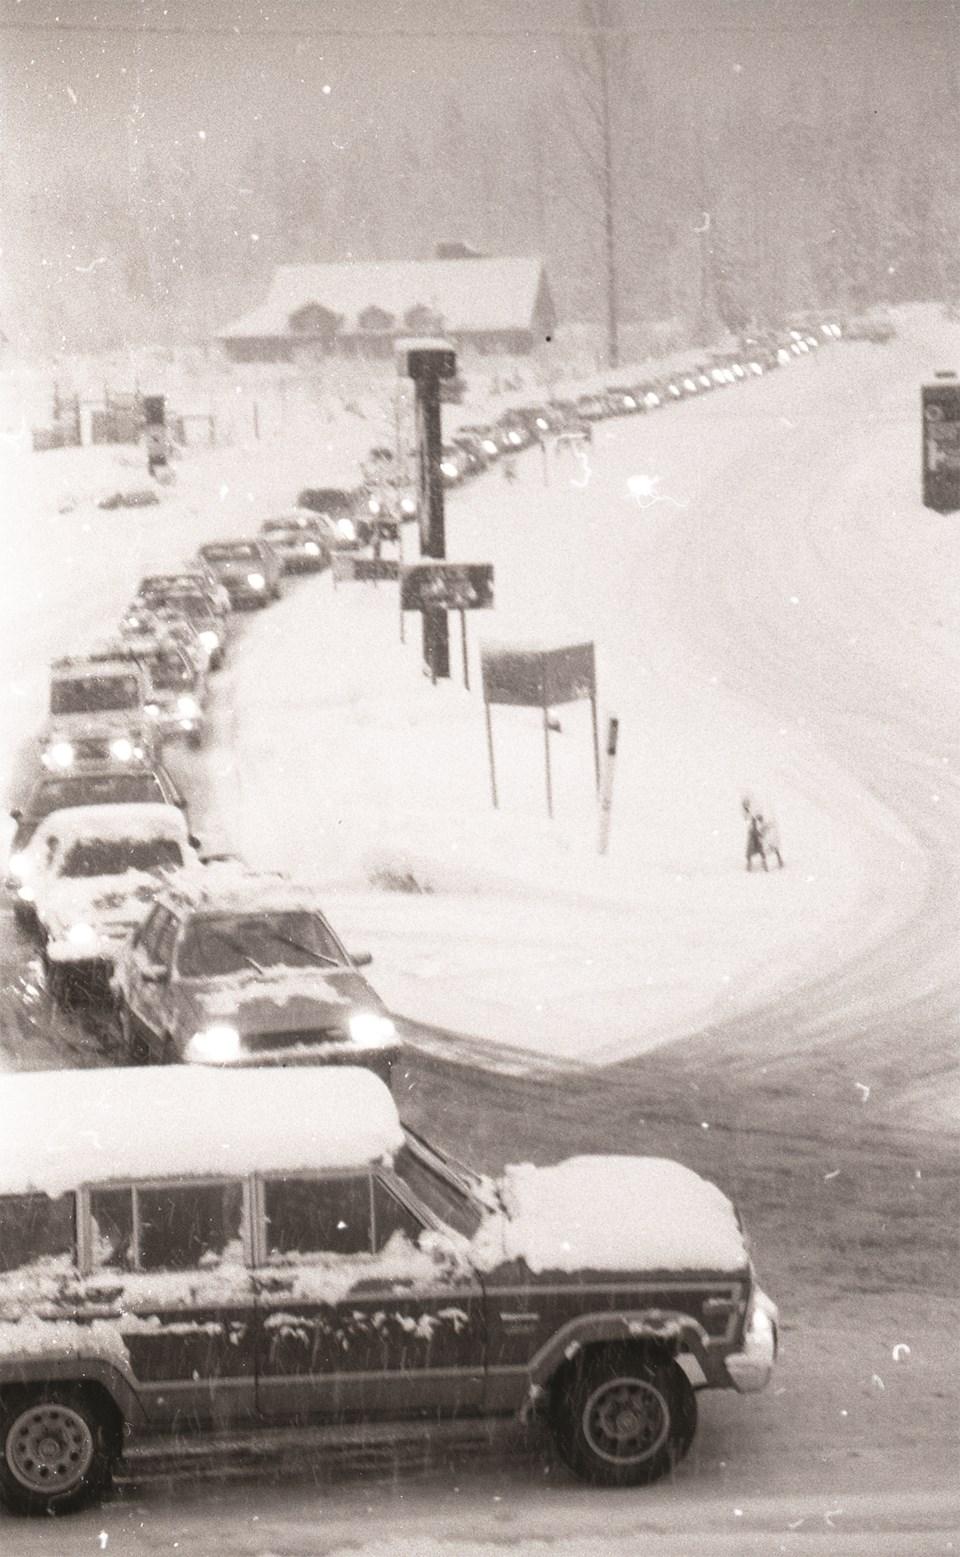 e-museum musings 27.52 traffic jam snow 1980 blackcomb WQ_2_389_A_003